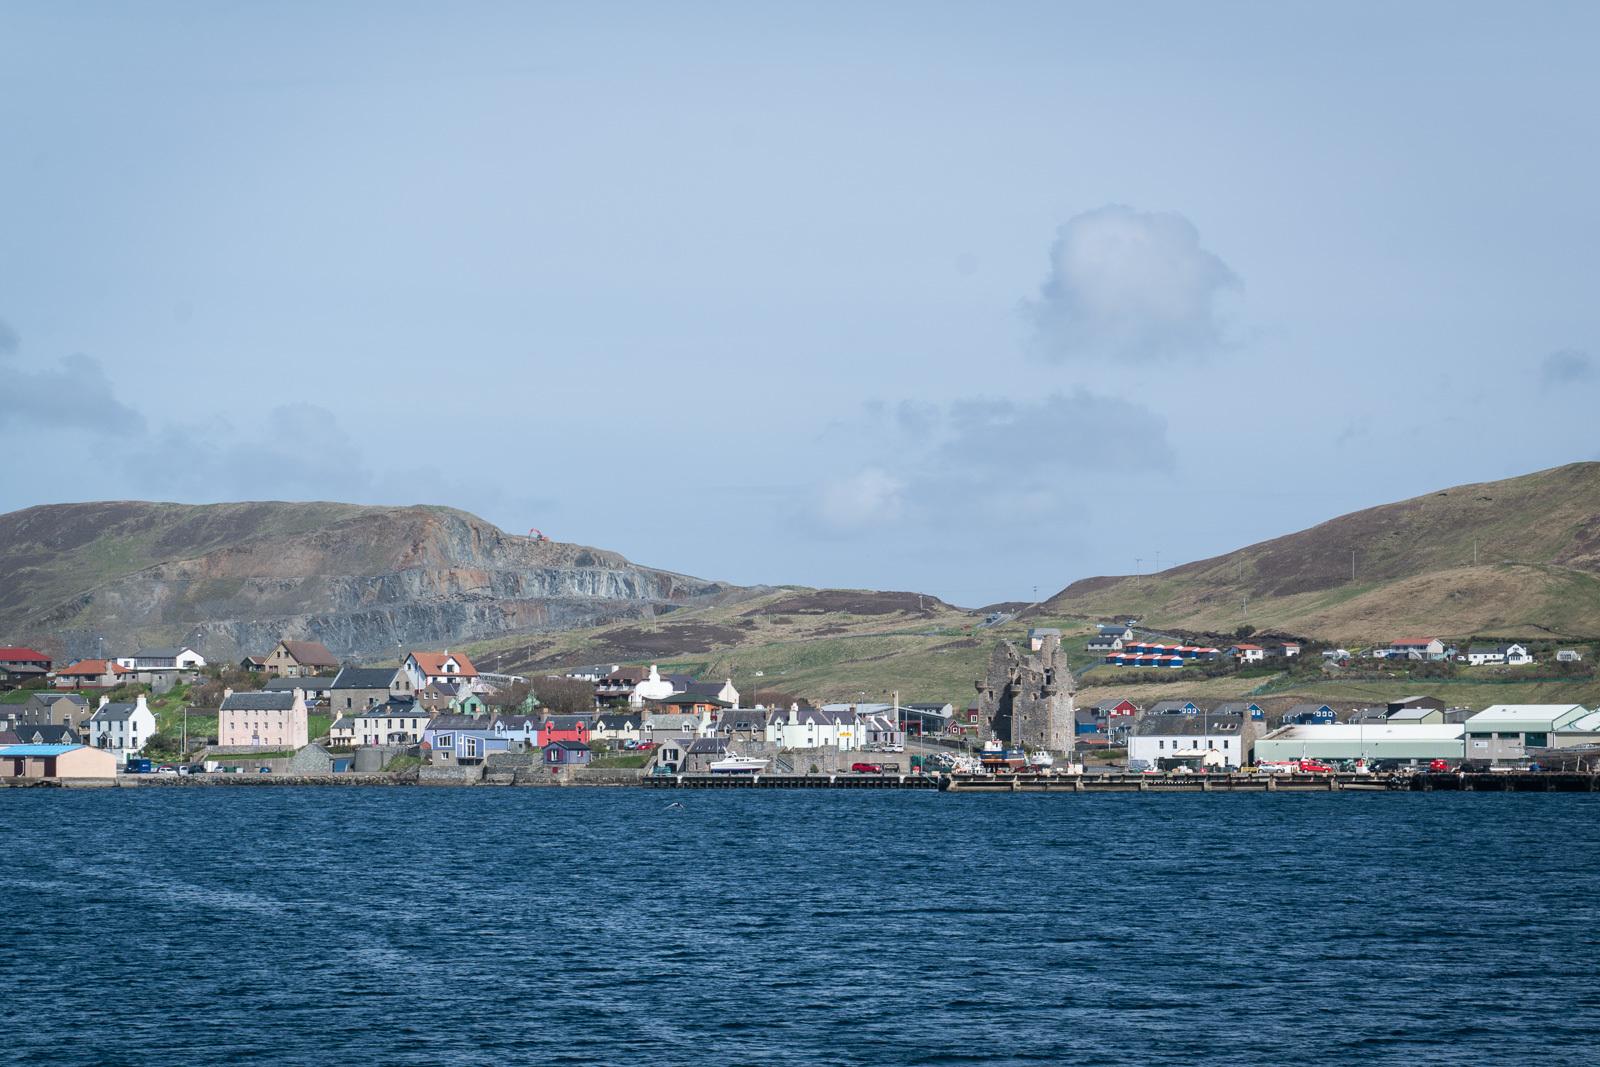 Scalloway on Shetland